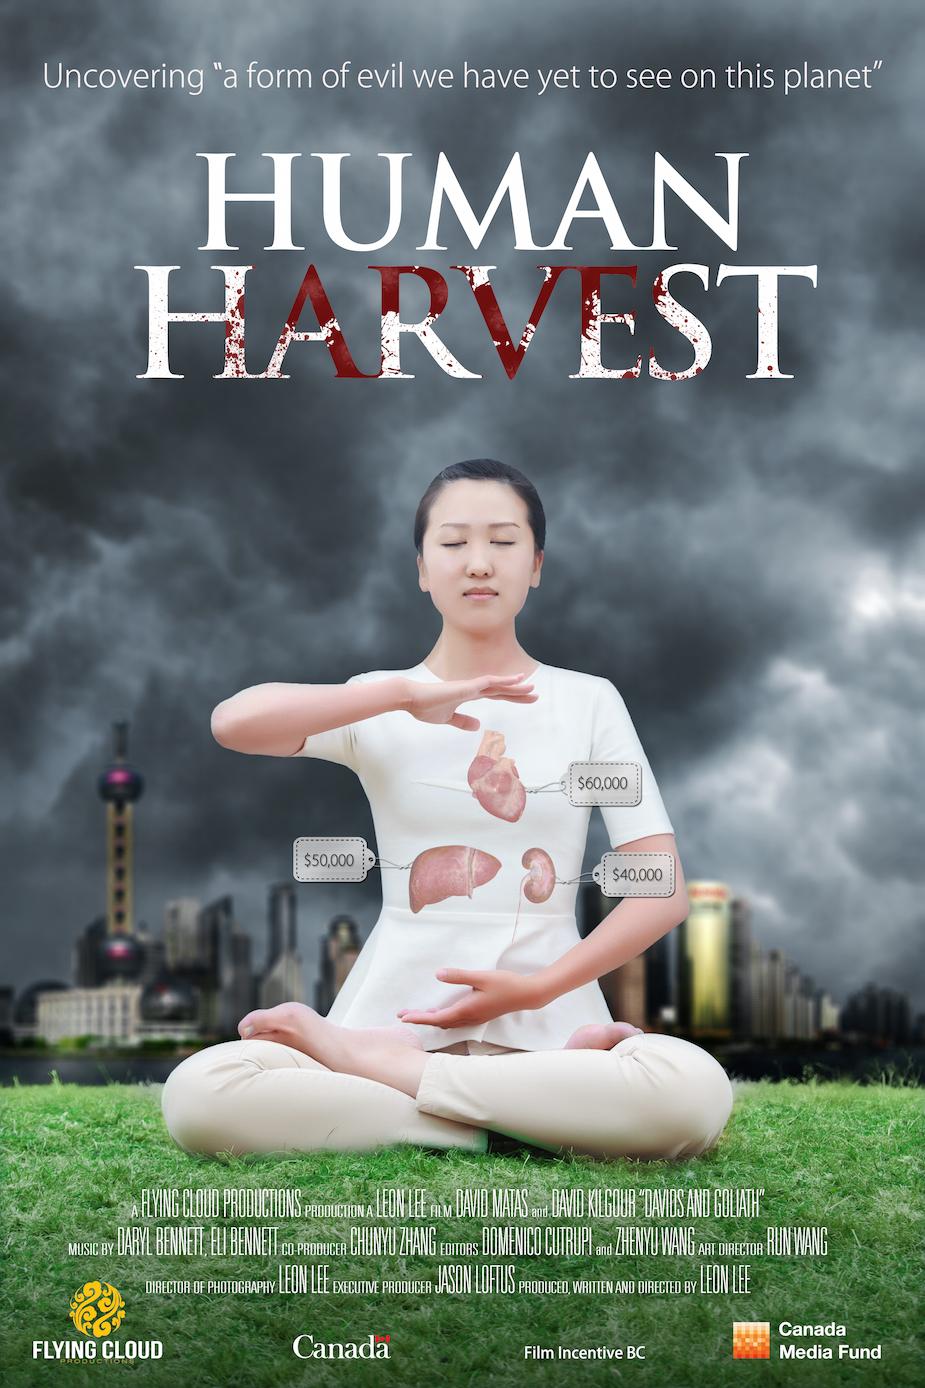 Human Harvest: China's Illegal Organ Trade (International Syndication)